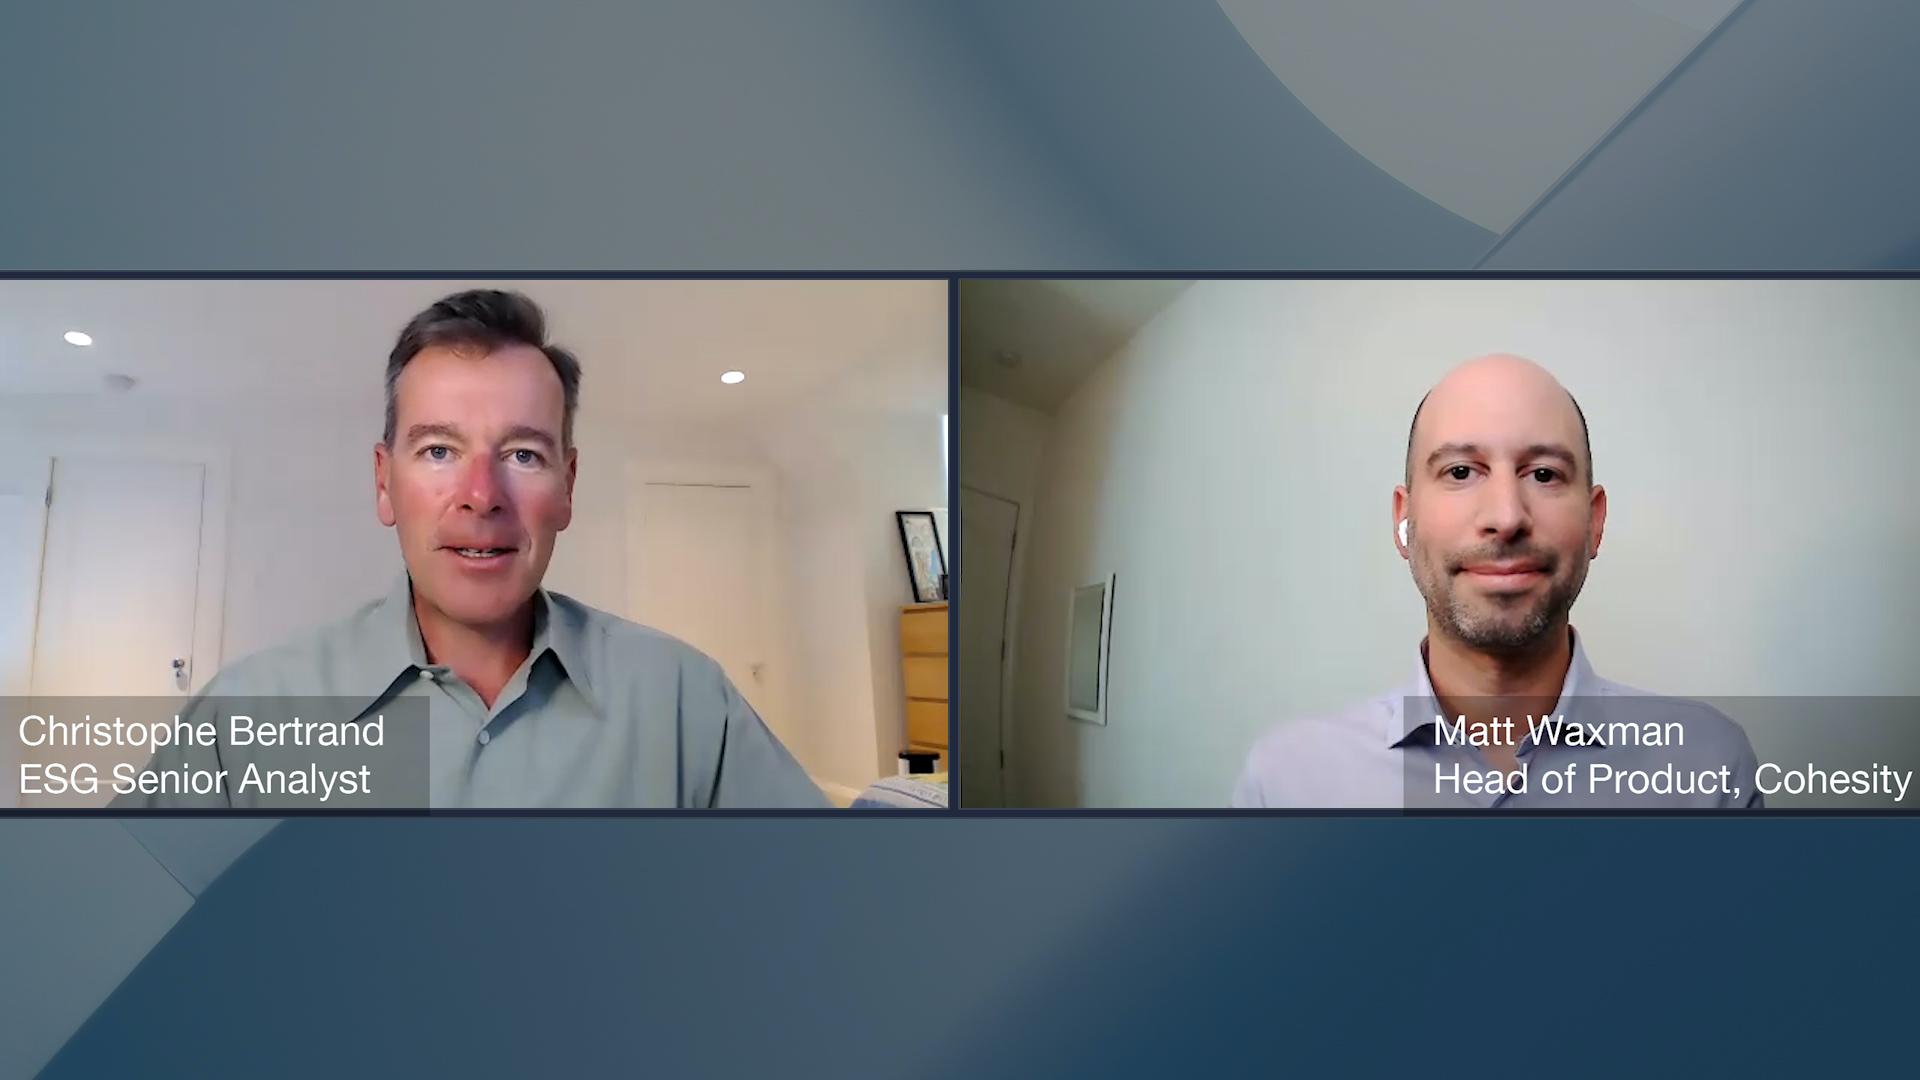 Data Protection Conversation with Matt Waxman of Cohesity (Video)